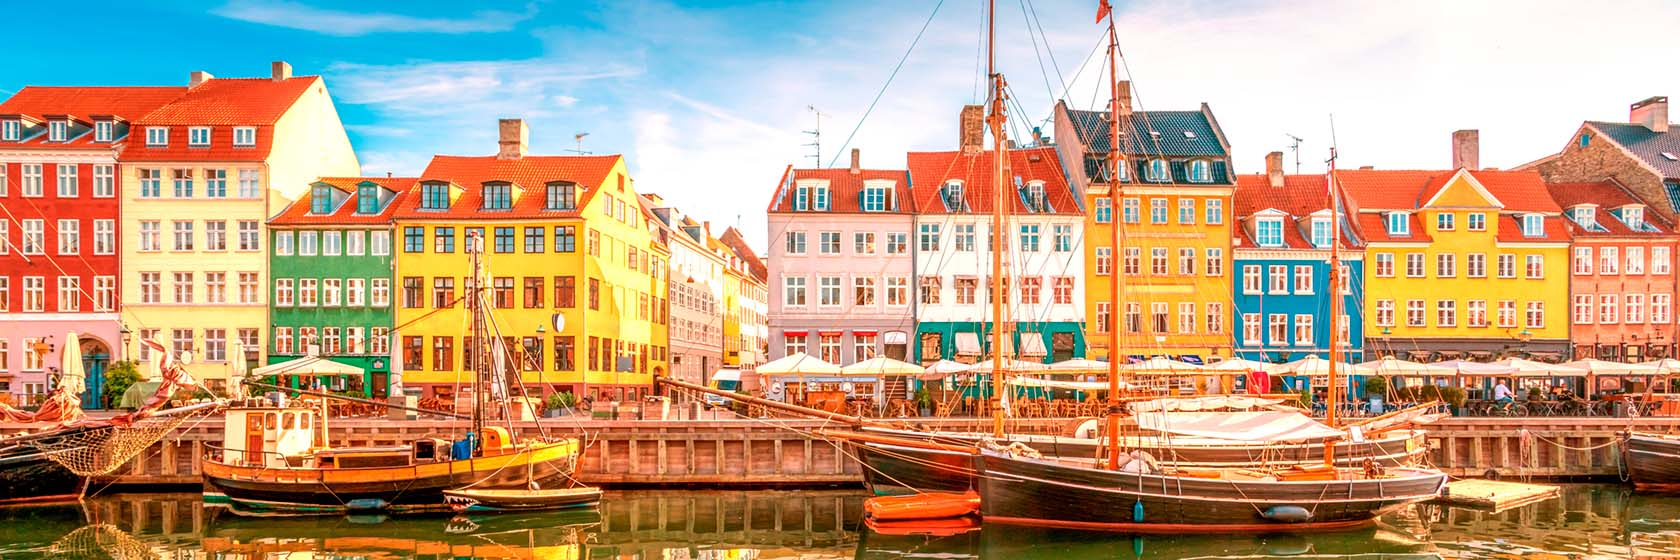 Scandinavia: Stockholm, Copenhagen & Oslo, 10 Days Stockholm to Oslo with A&K